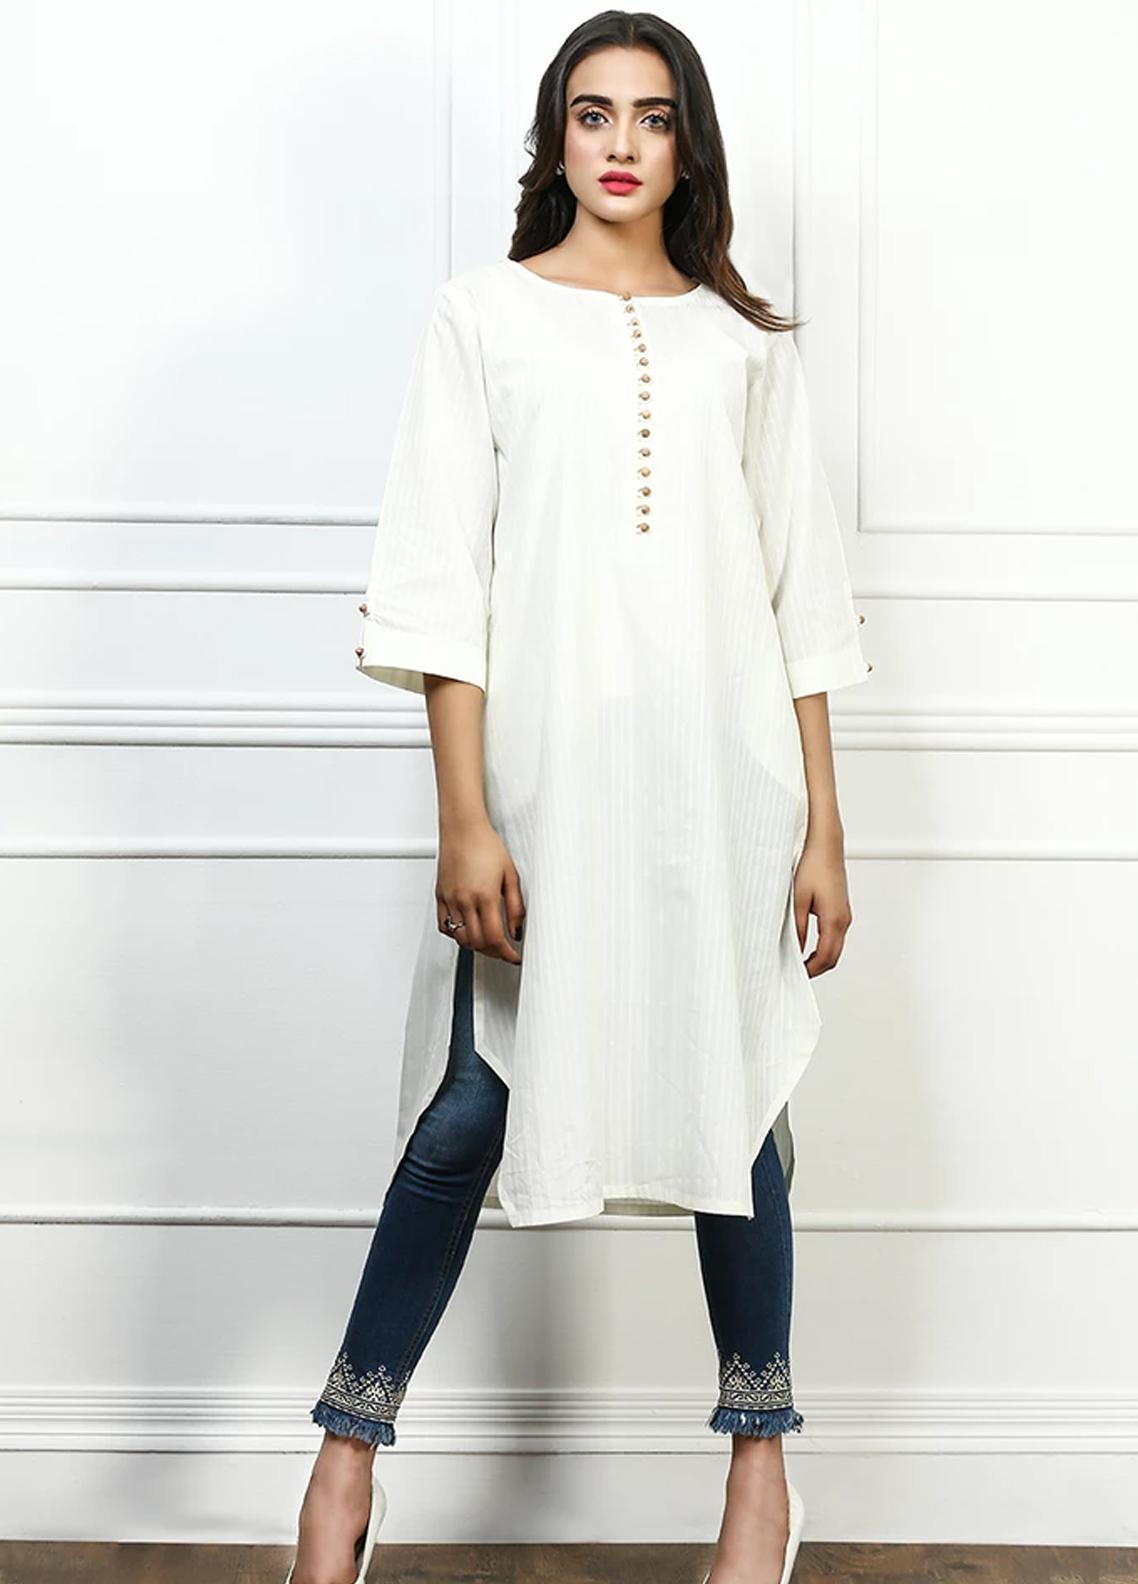 Pulsar Fancy Style Cotton Stitched Kurtis Bold White